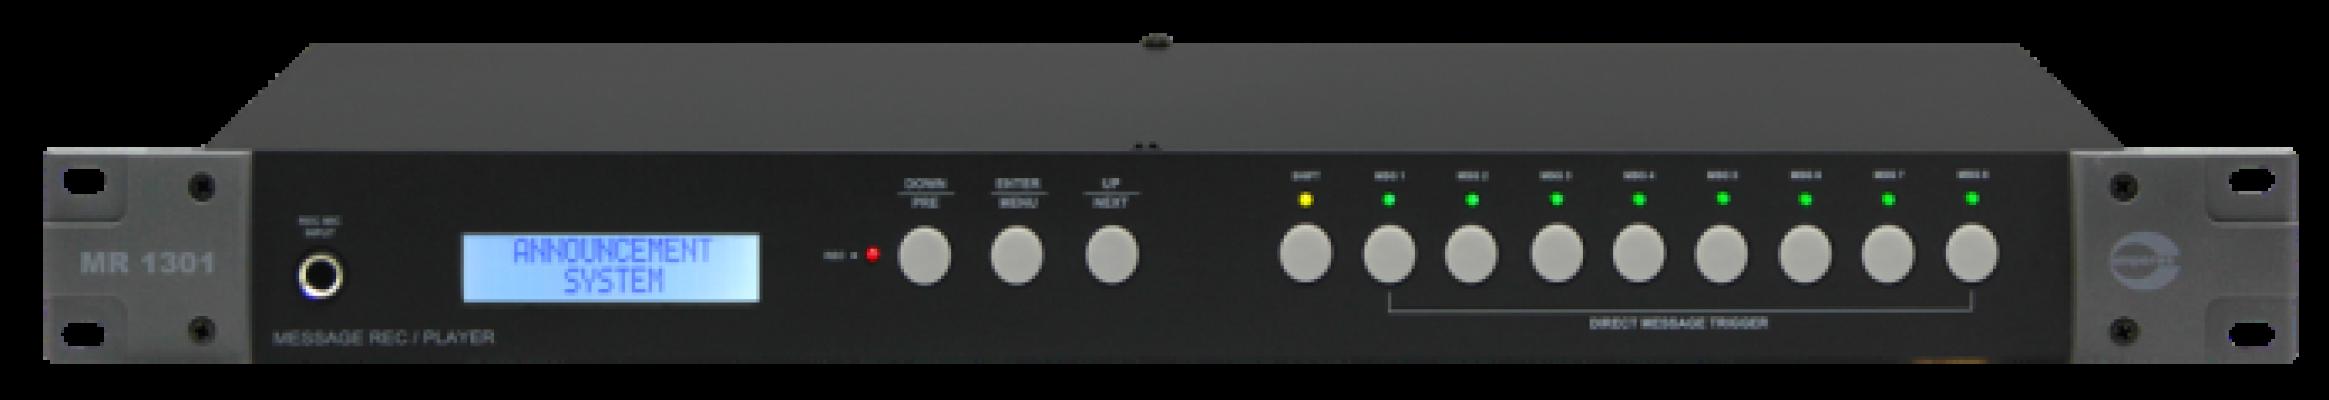 MR1301 [ DIGITAL MESSAGE RECORDER / PLAYER ]